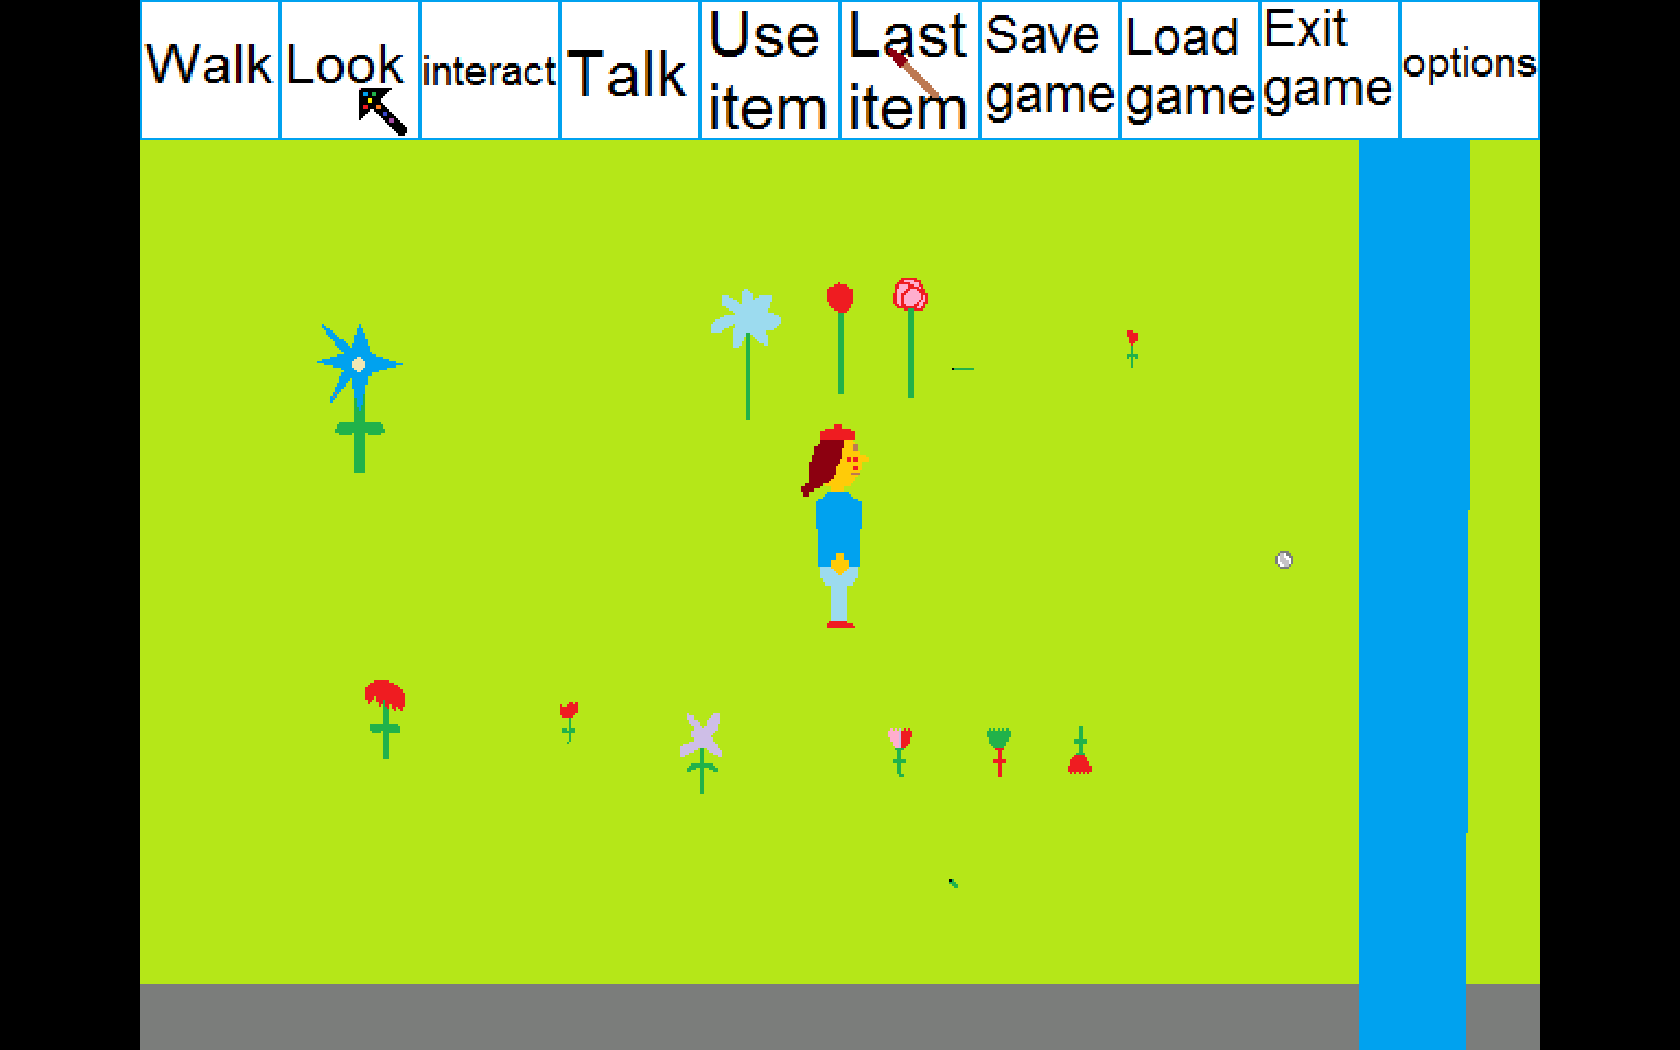 Screenshot 3 of Essence of Imagination width=